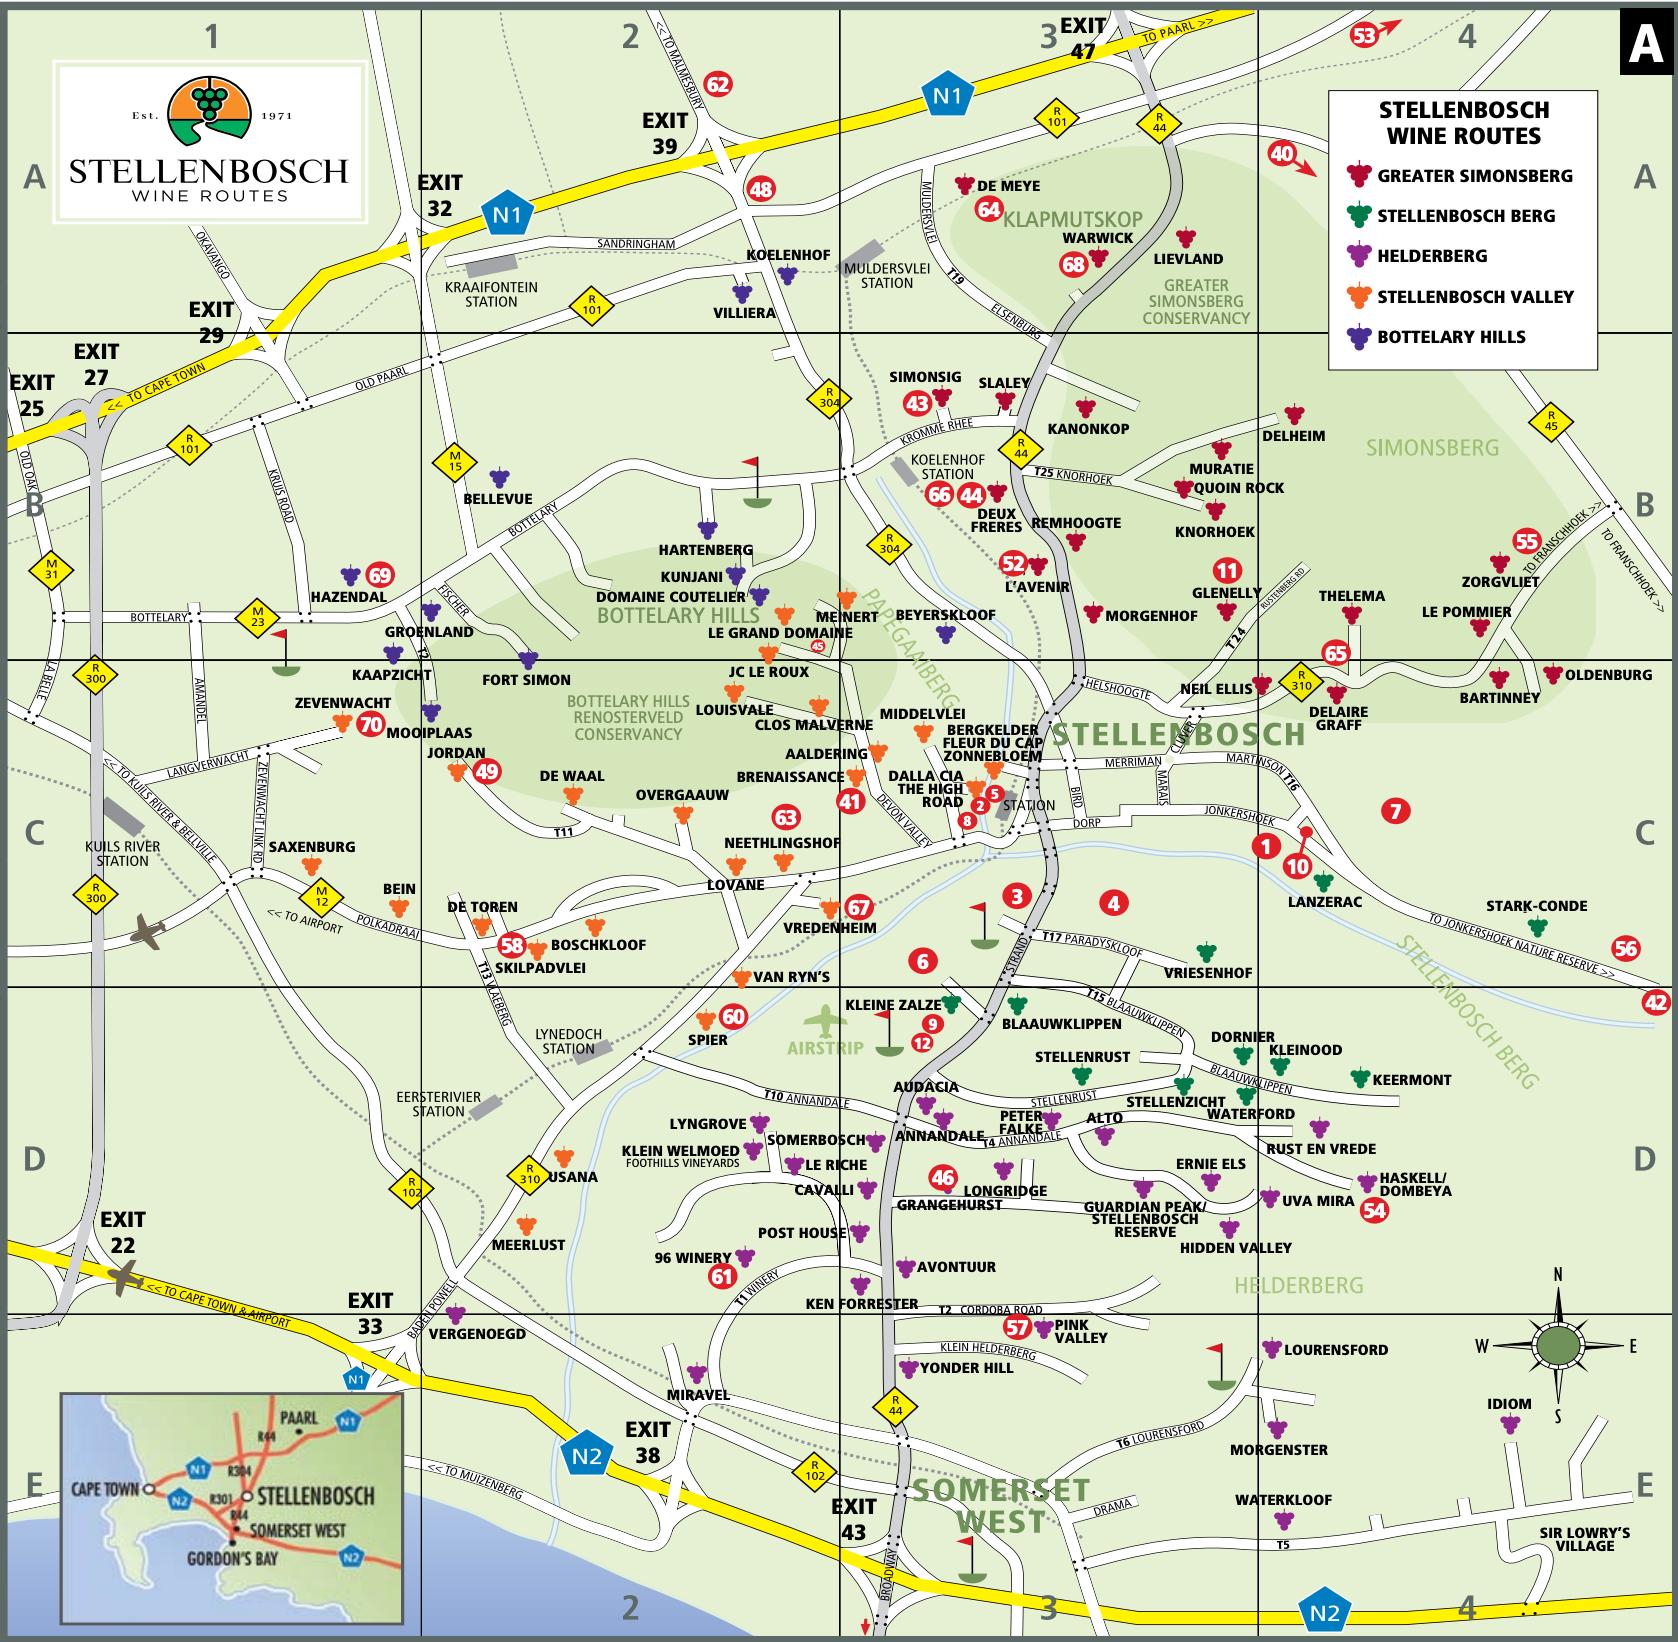 Map of Stellenbosch Wine Routes